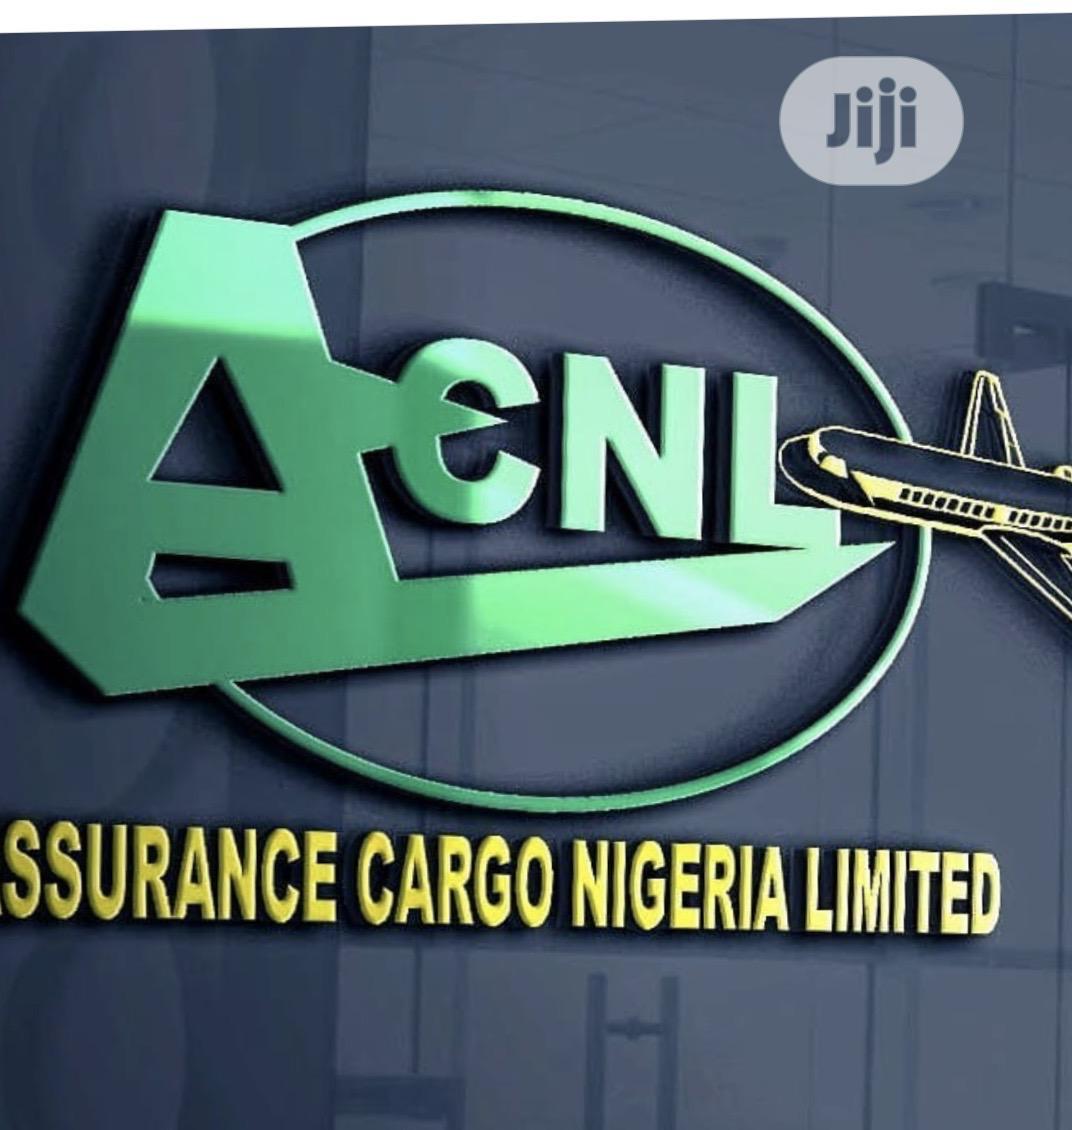 Assurance Cargo Nigeria Limited Is a Cargo Company.